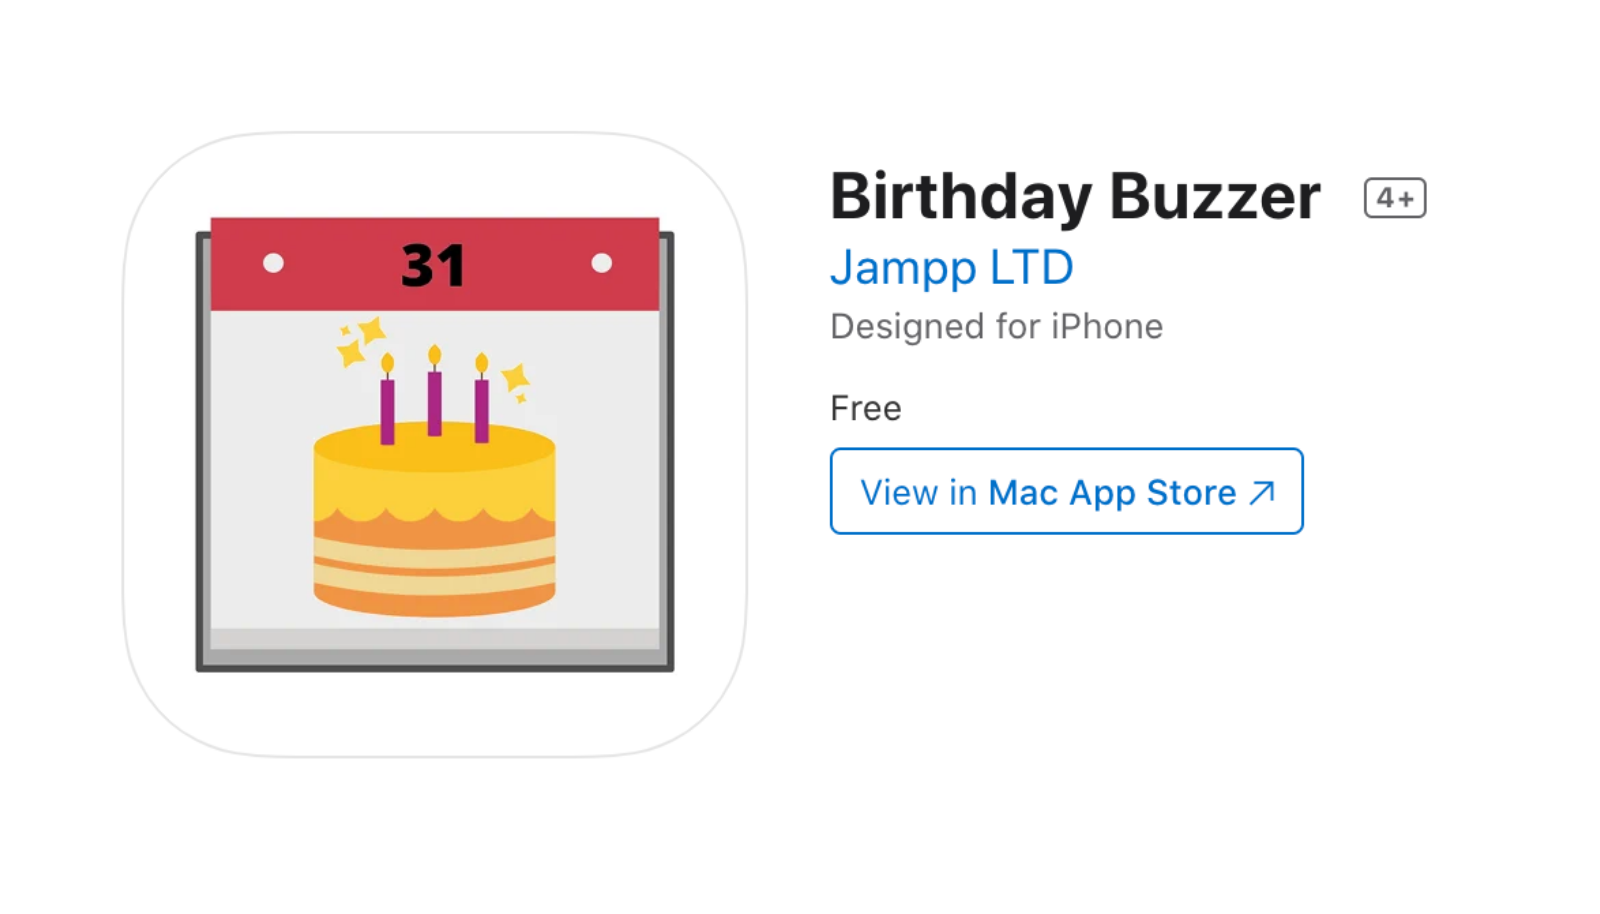 Jampp's Birthday Buzzer app